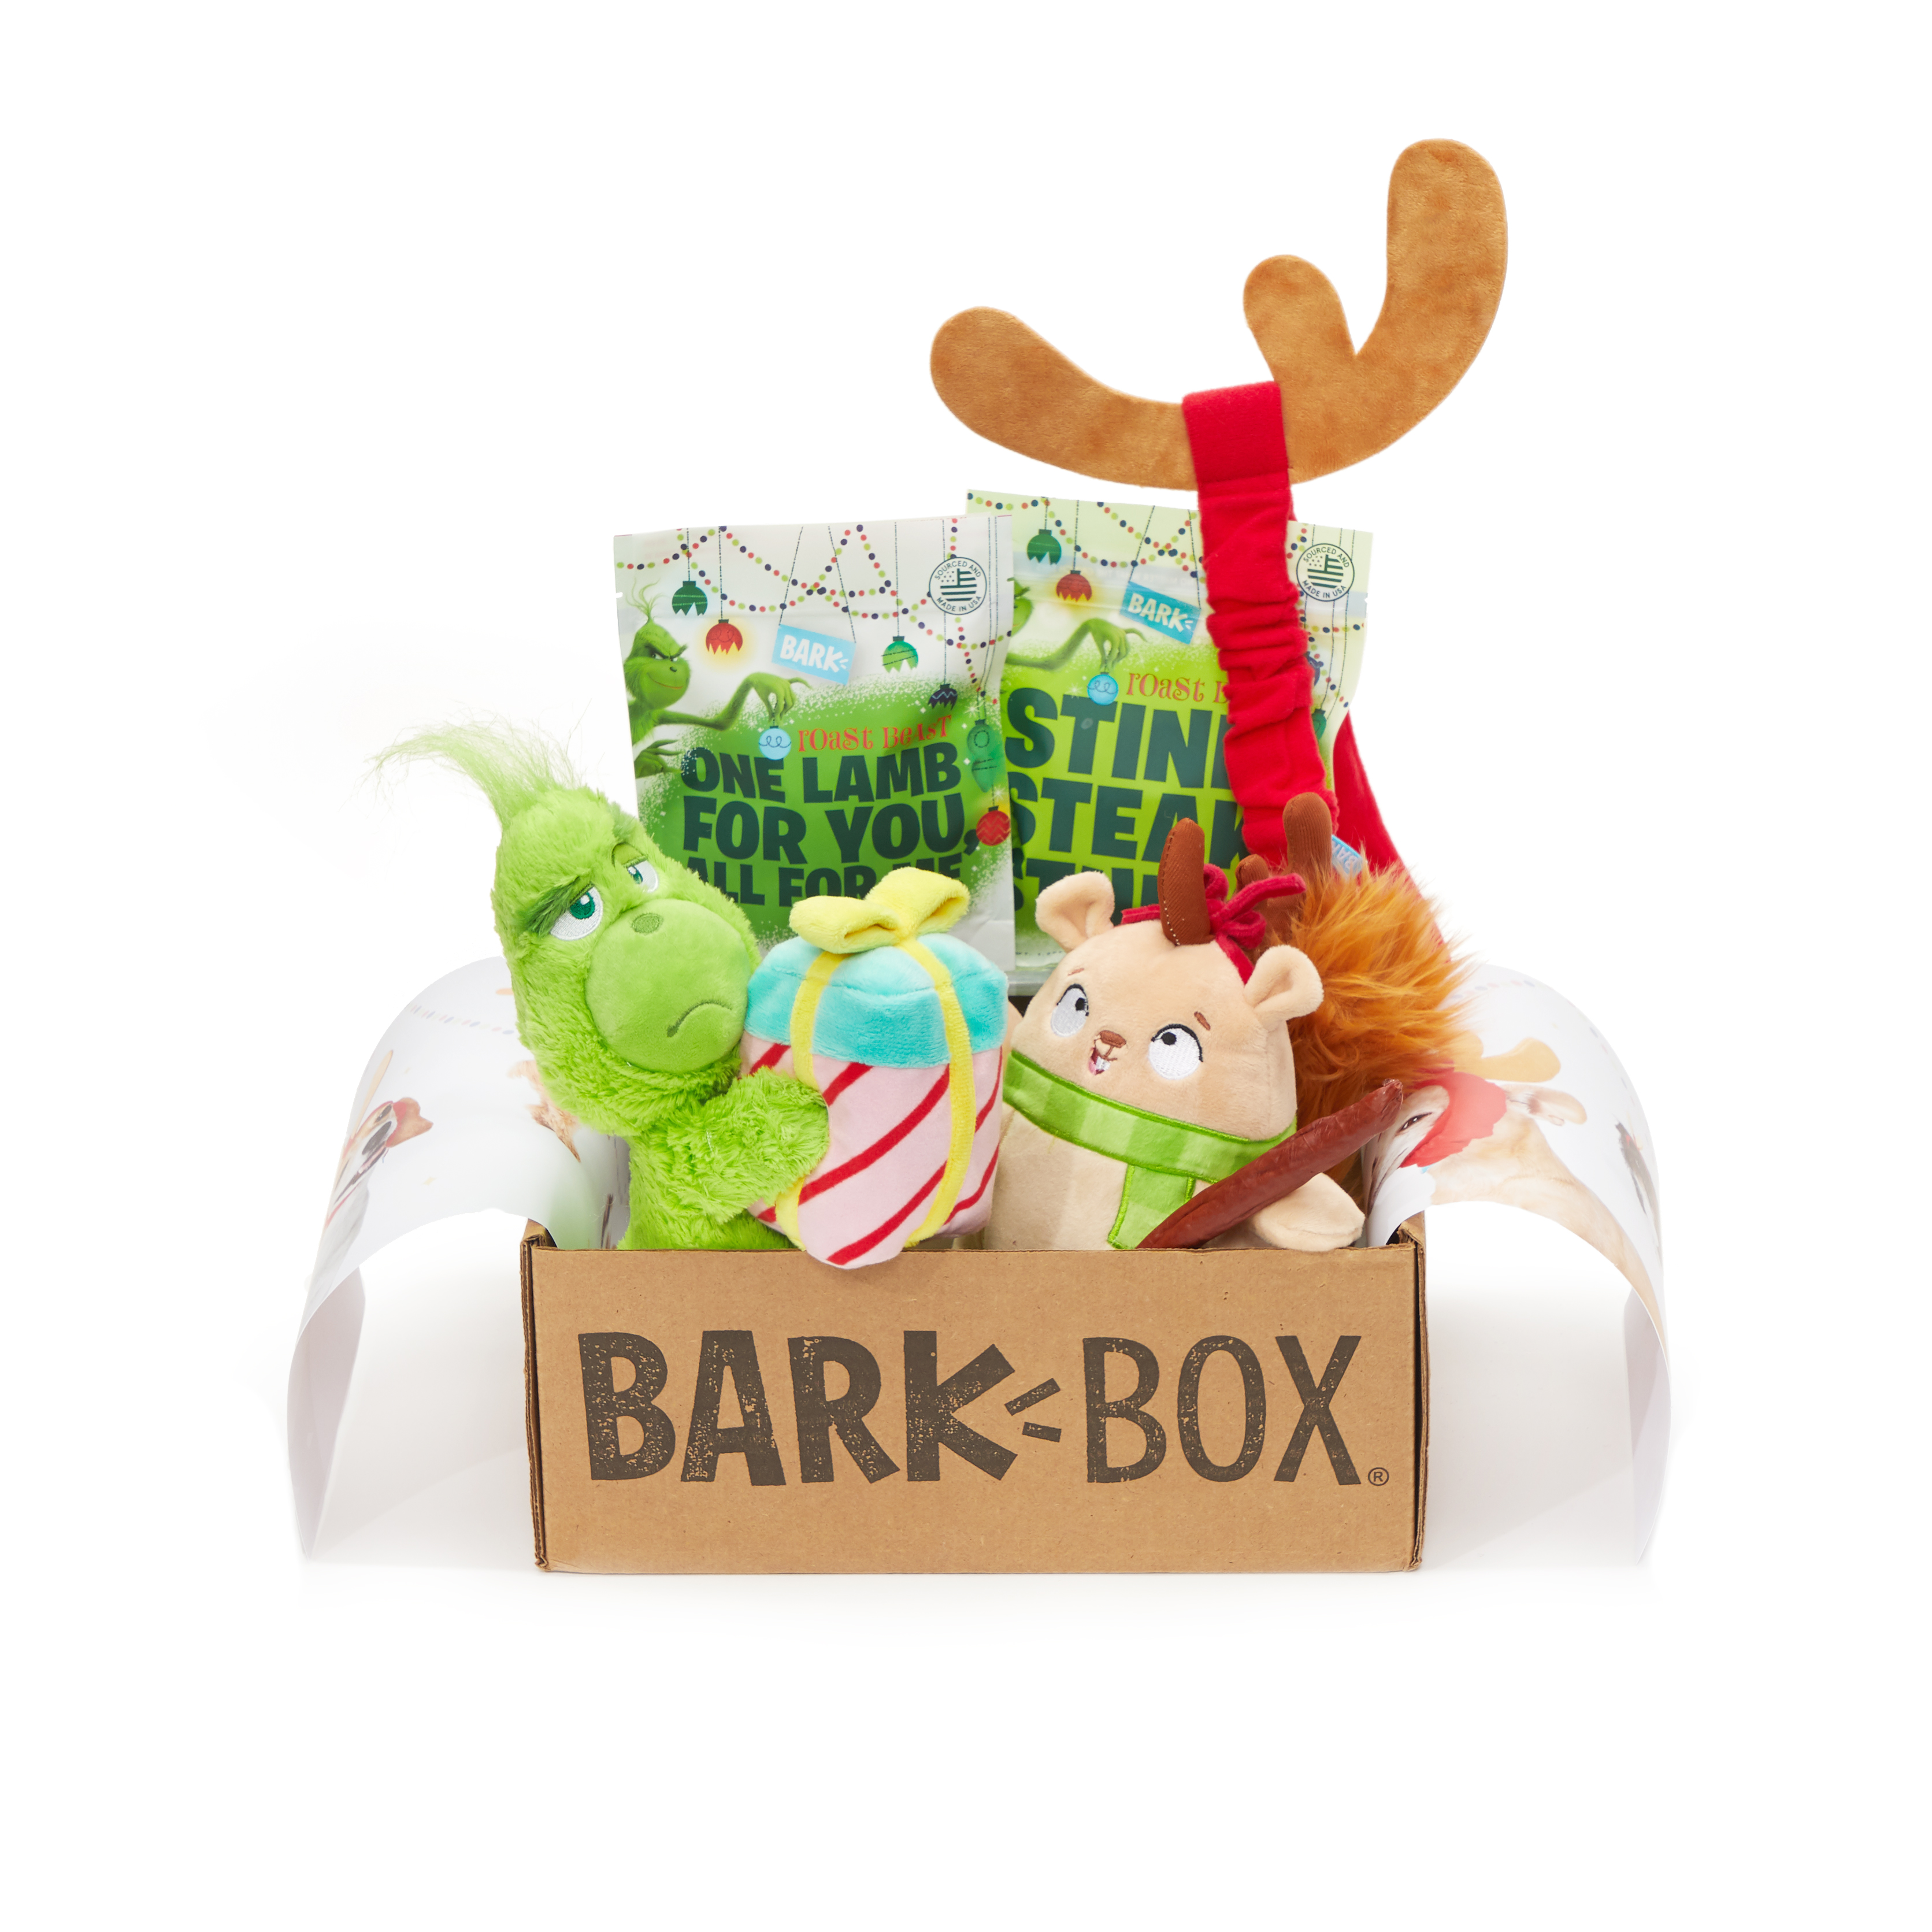 Barkbox Holiday Box, Grinch